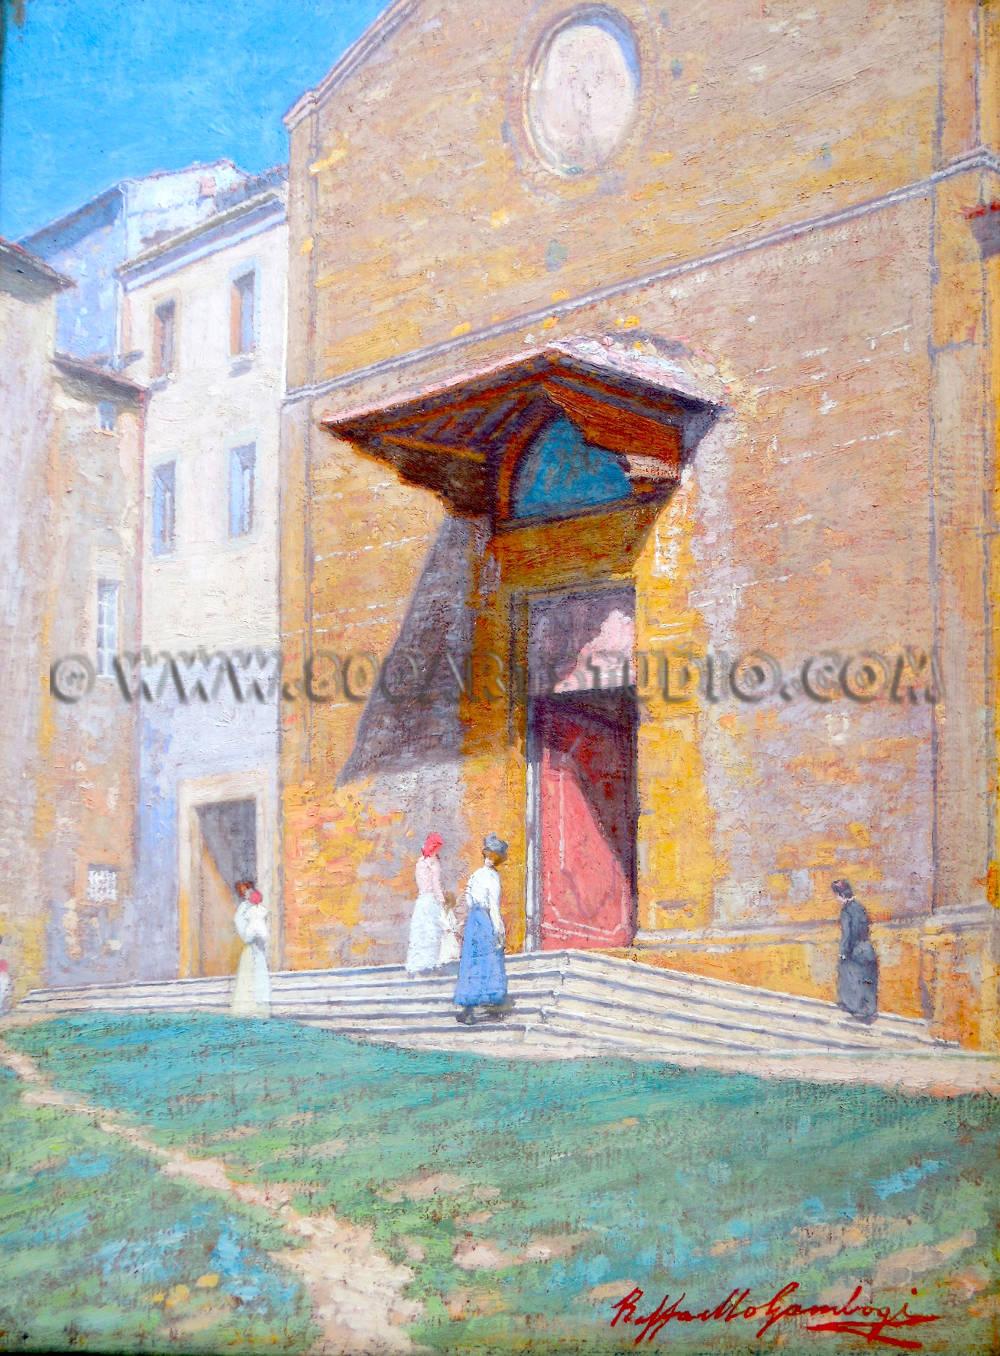 Raffaello Gambogi - La chiesa di San Francesco a Volterra